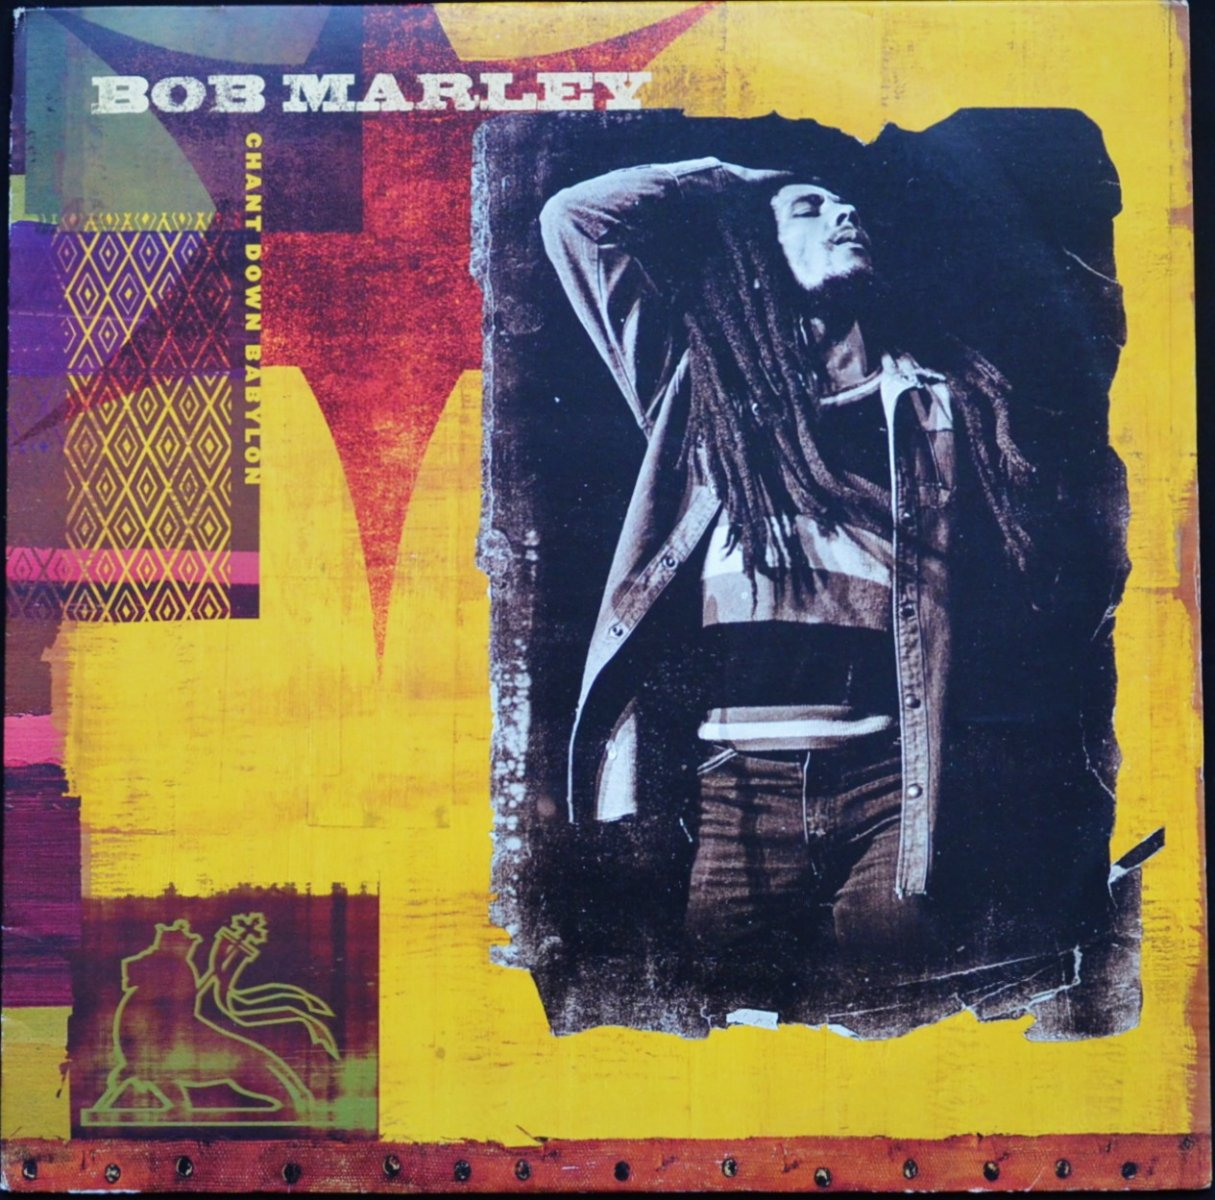 BOB MARLEY / CHANT DOWN BABYLON (1LP)